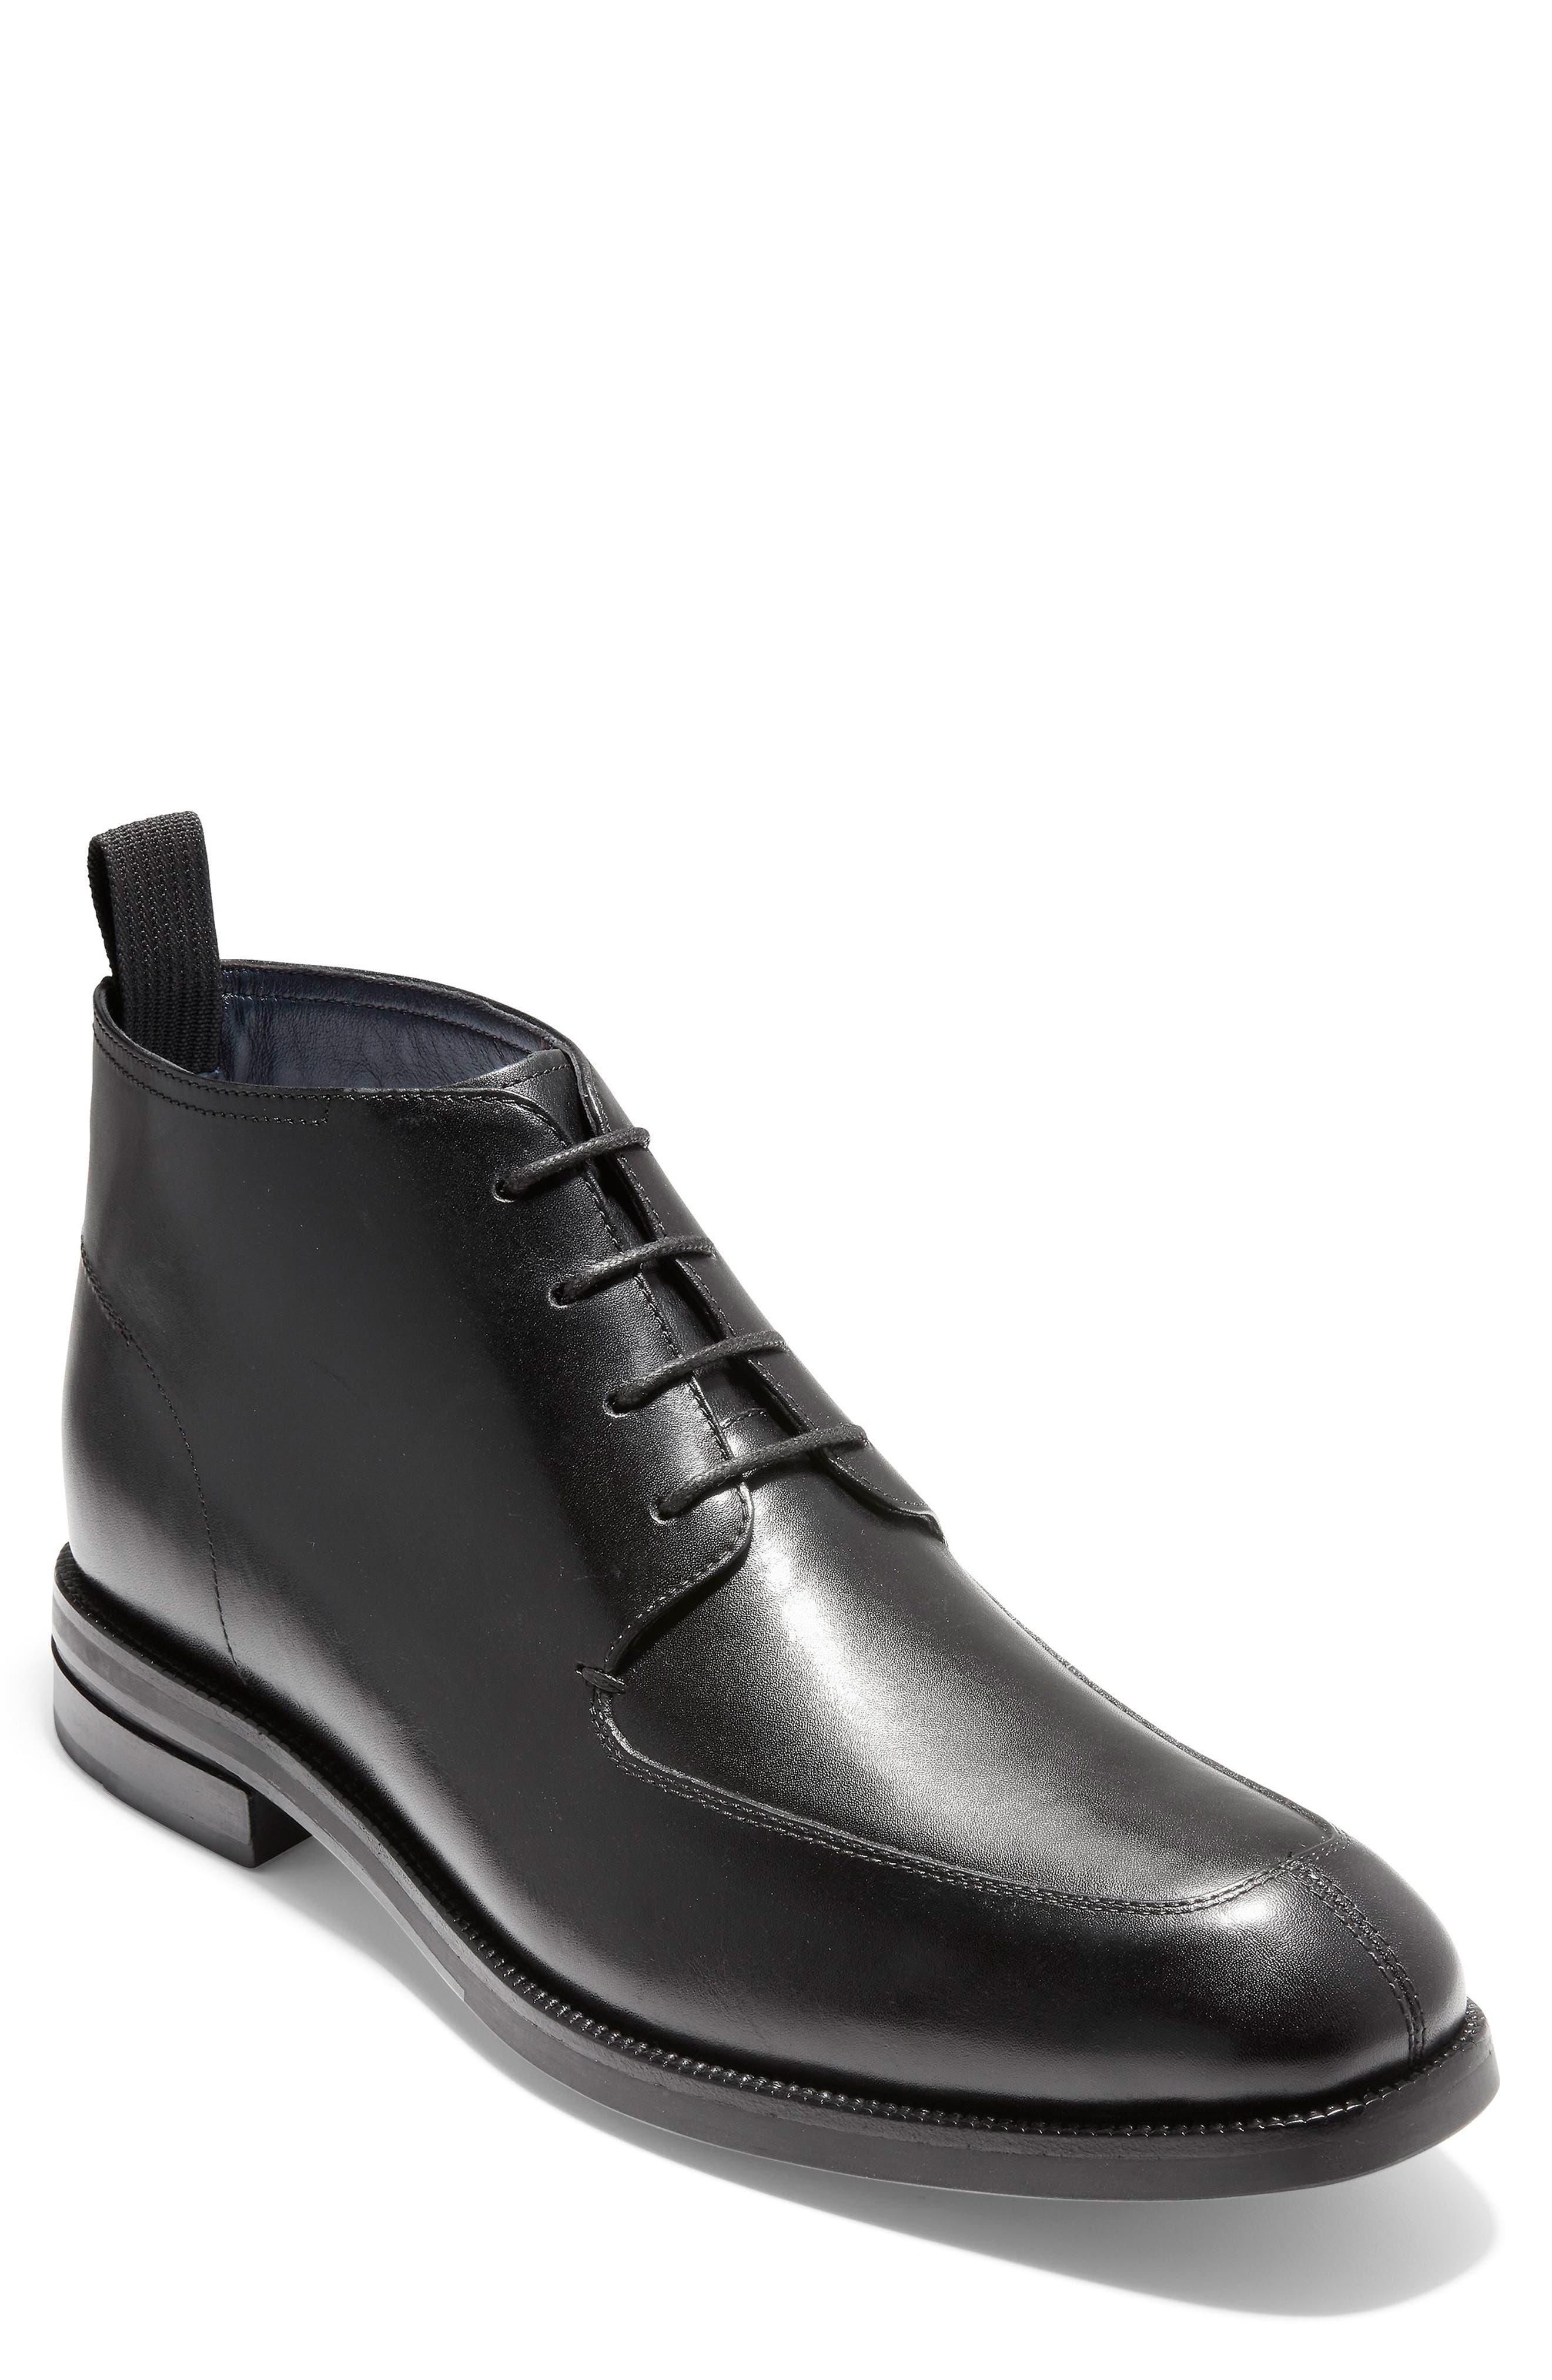 Wagner Grand Split Toe Boot,                         Main,                         color, 001